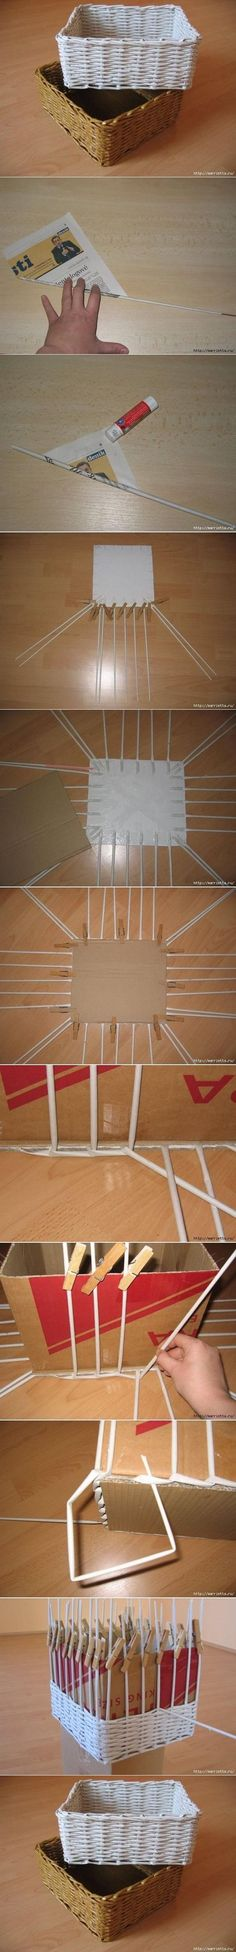 woven paper baskets